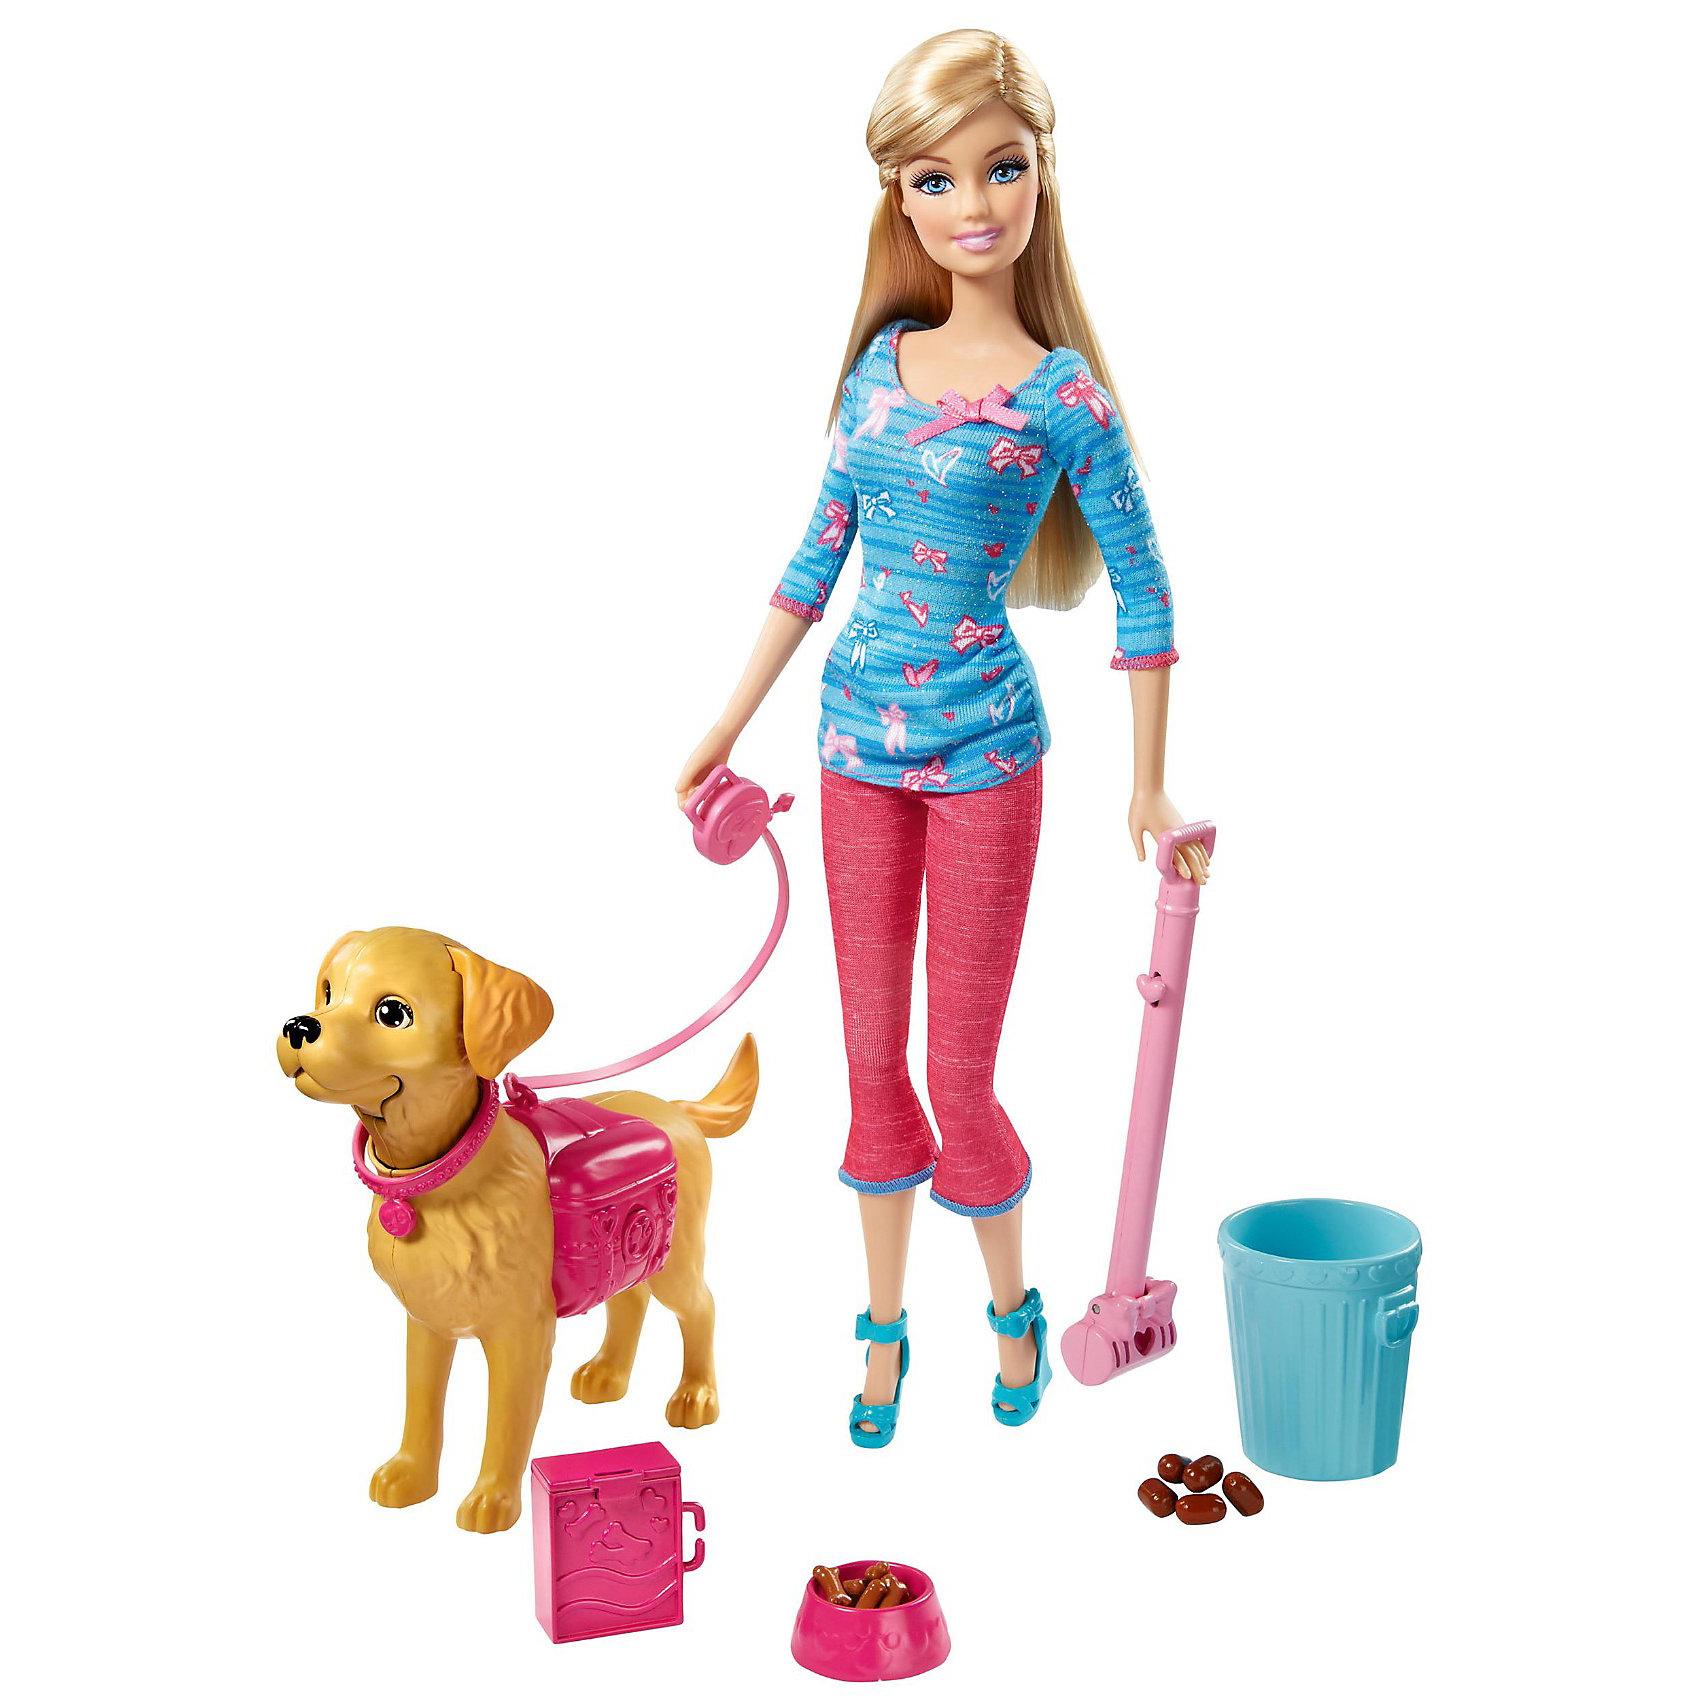 Кукла Барби выгуливает собачку, Barbie